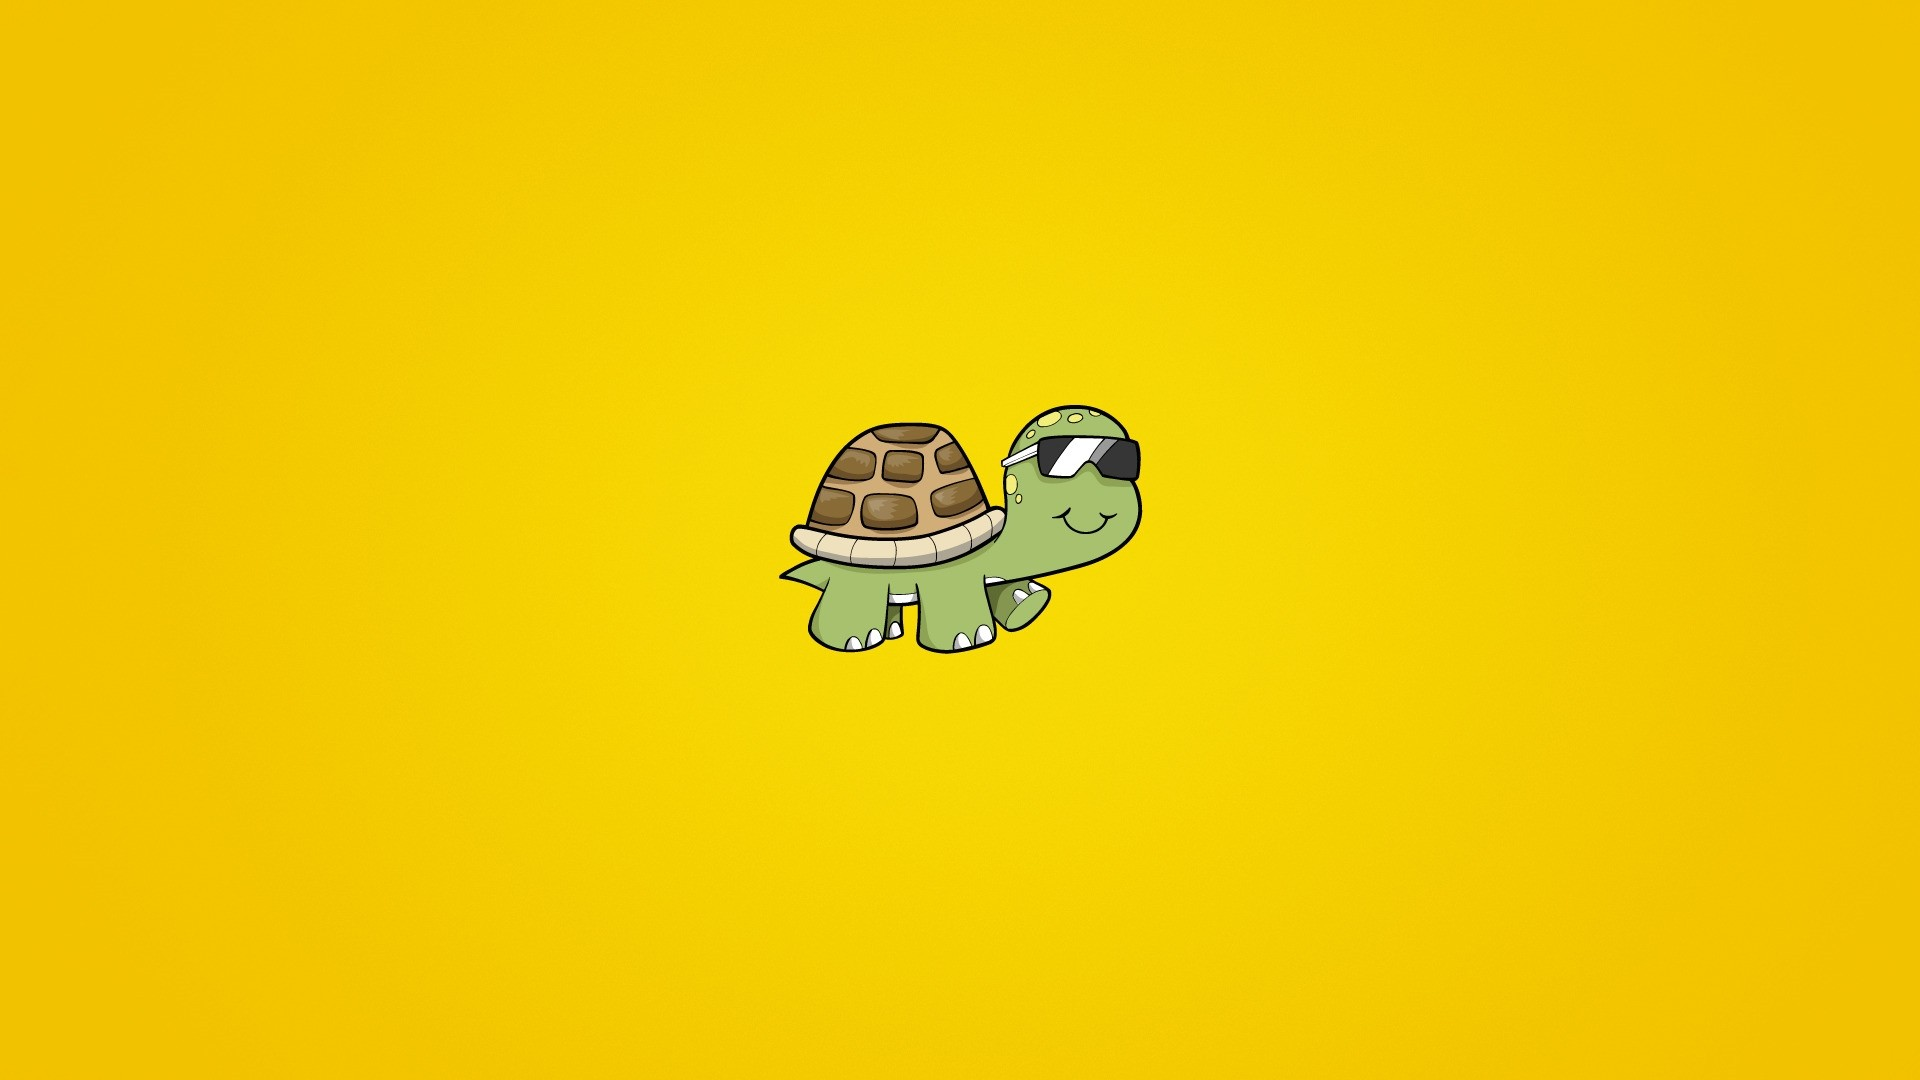 Turtle Minimalist Wallpaper